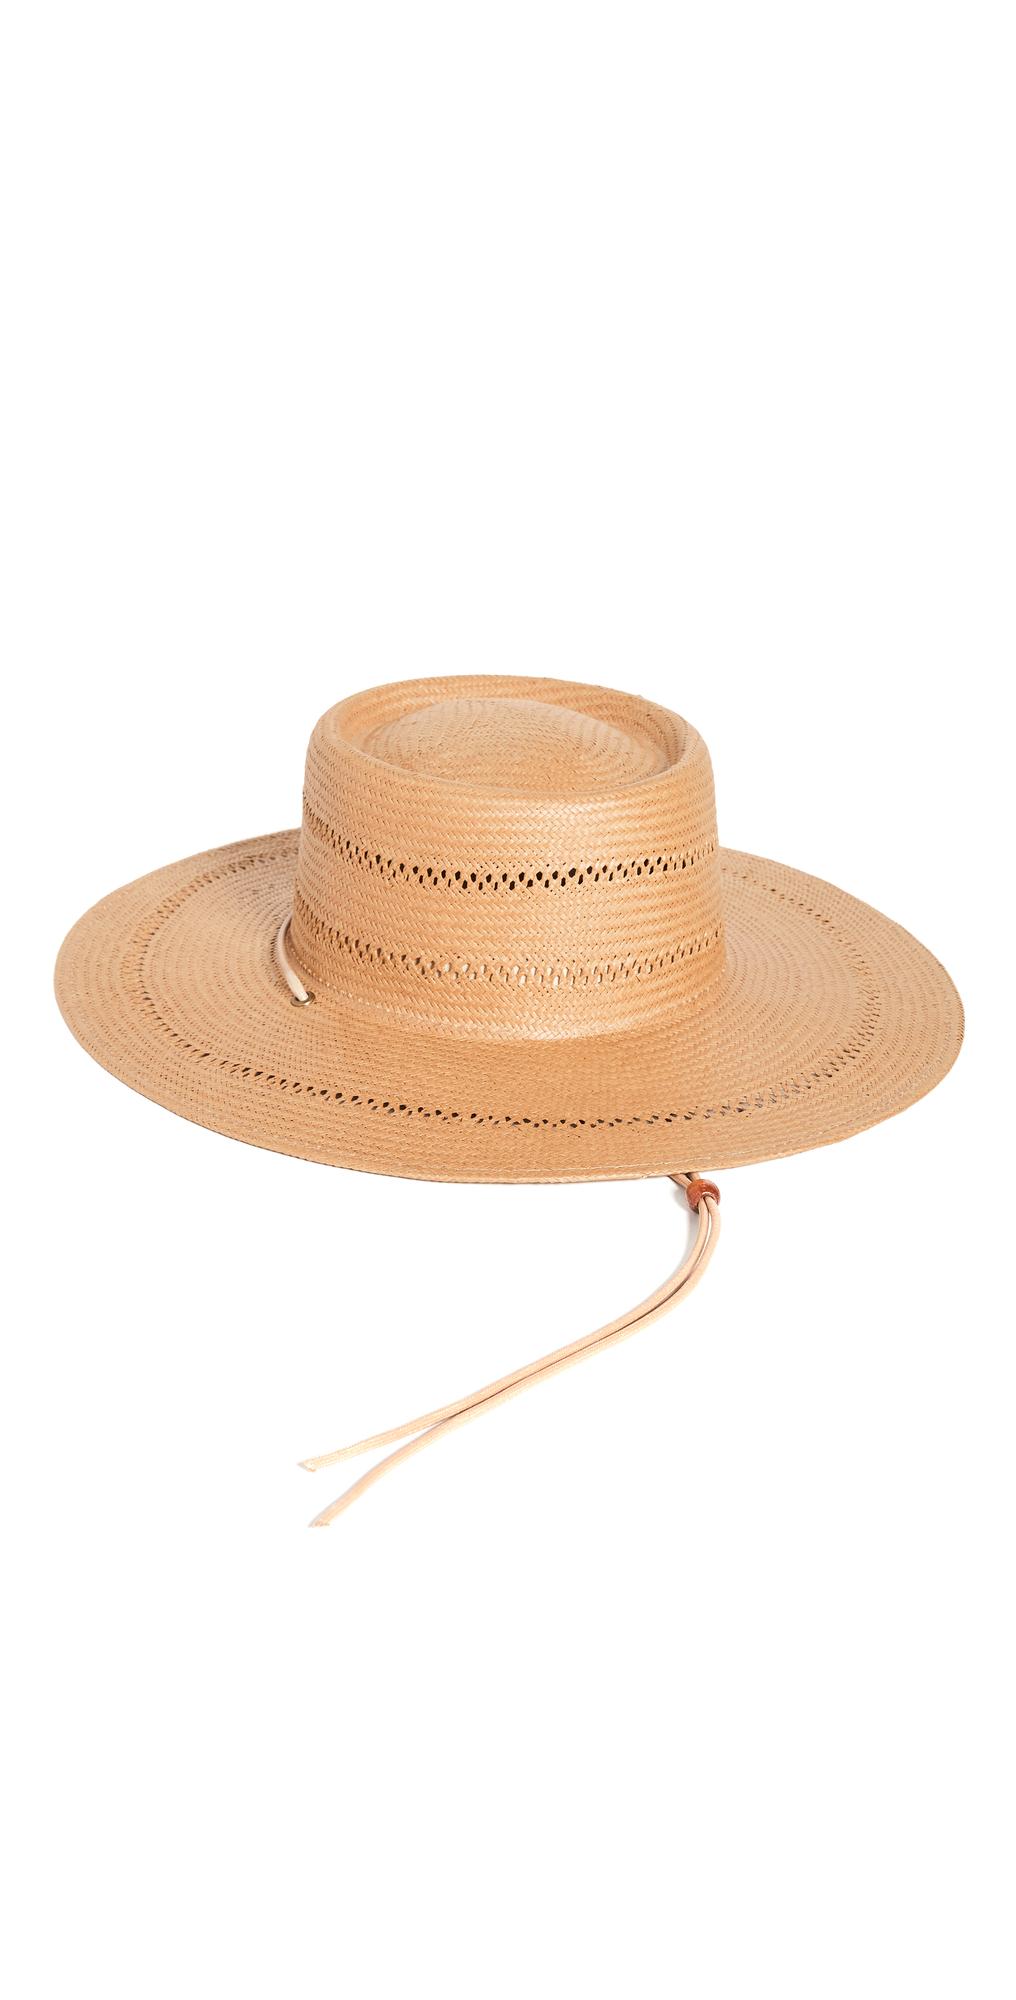 The Jacinto Straw Hat